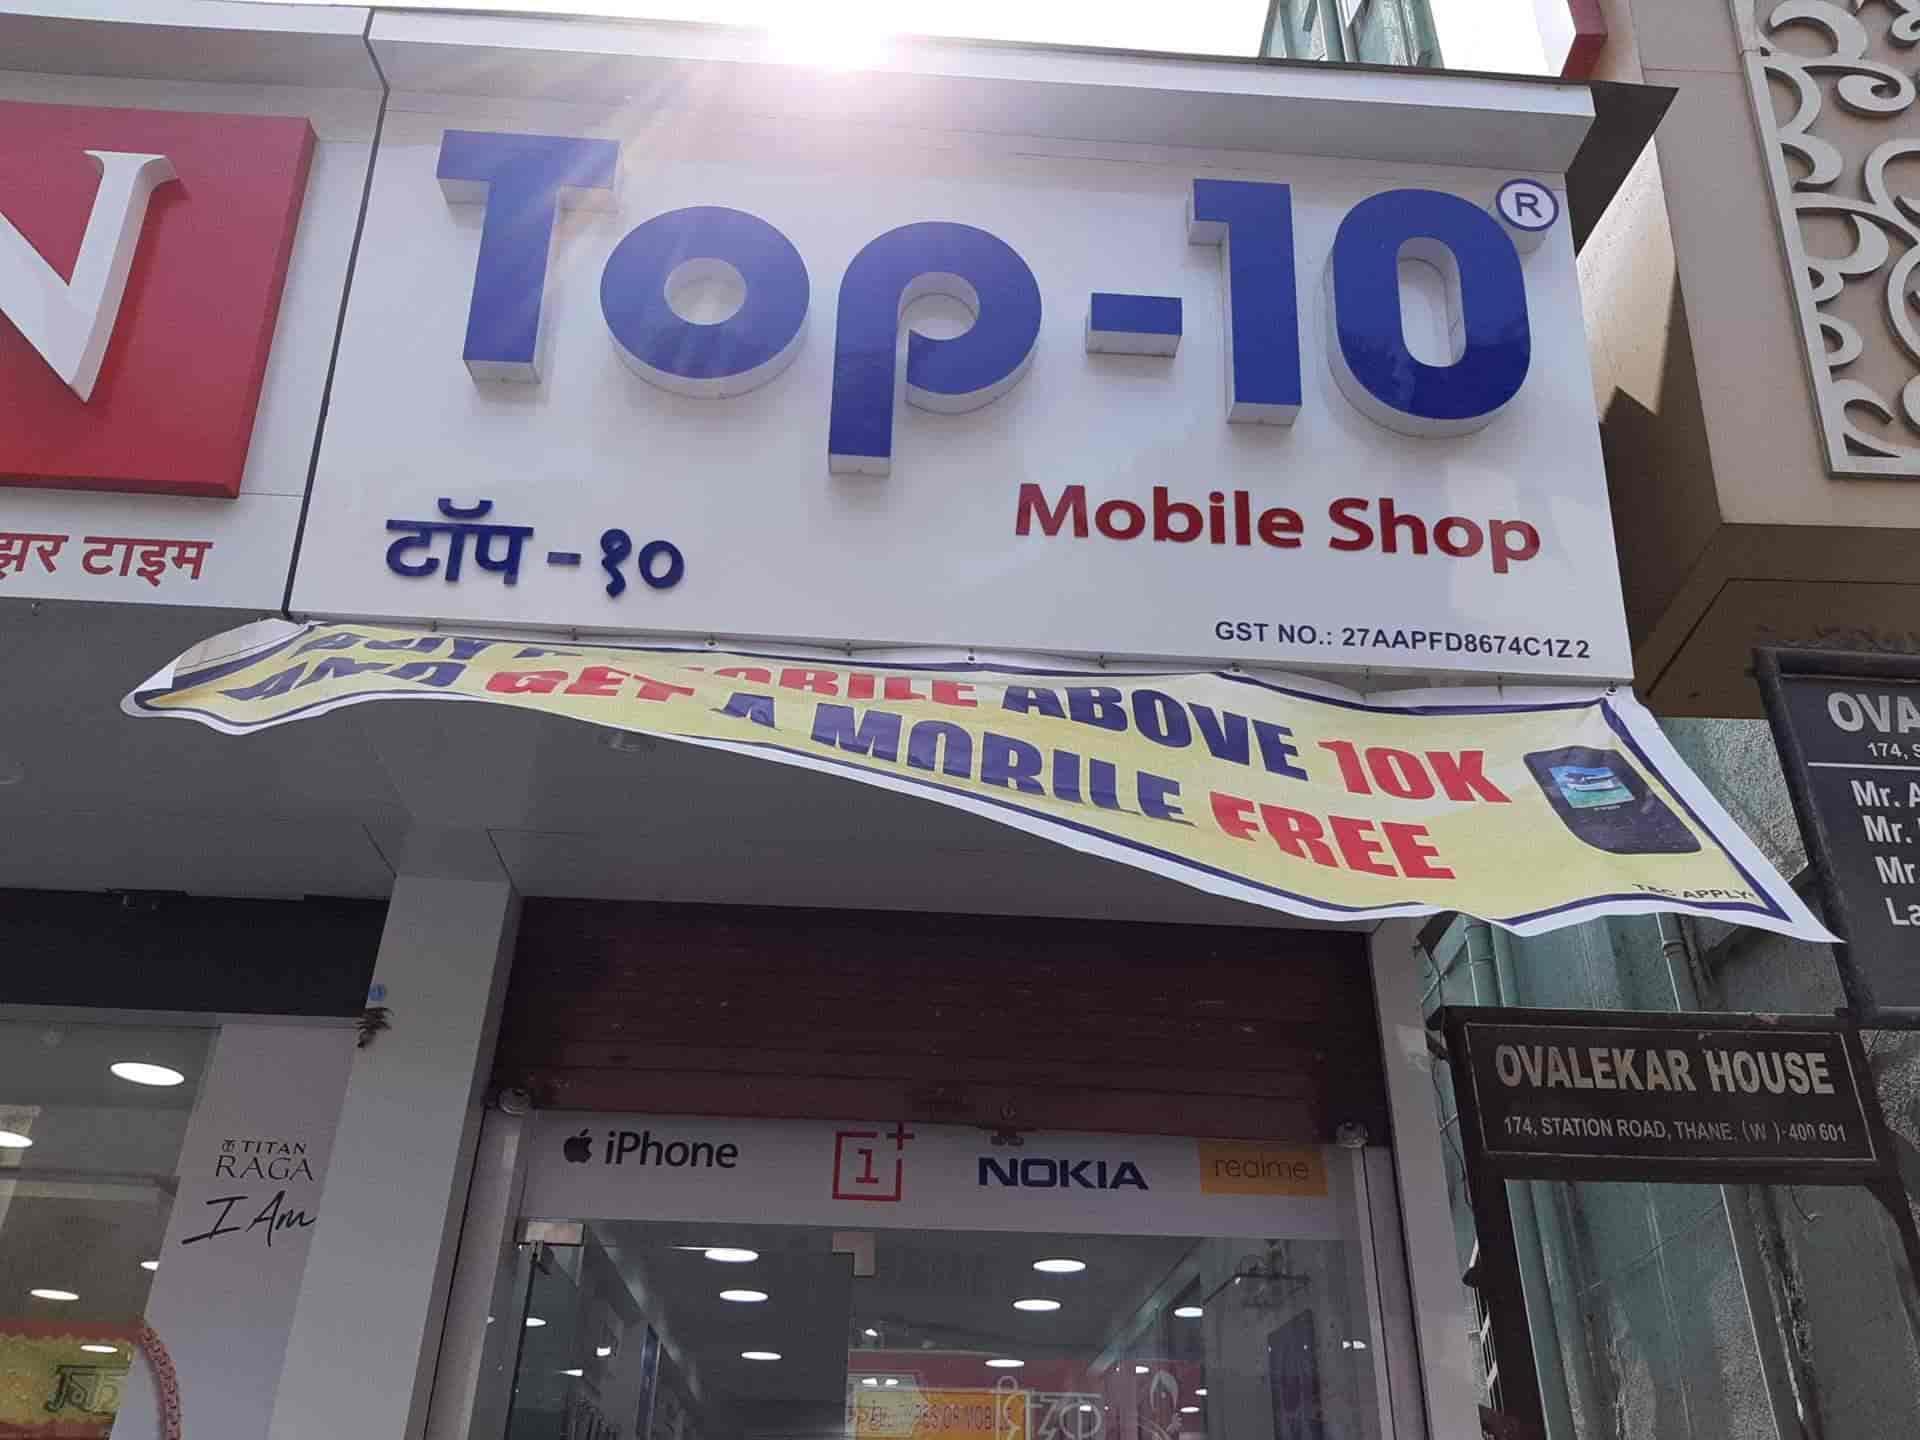 Top 10 Mobile Shop Photos, Thane West, Thane- Pictures